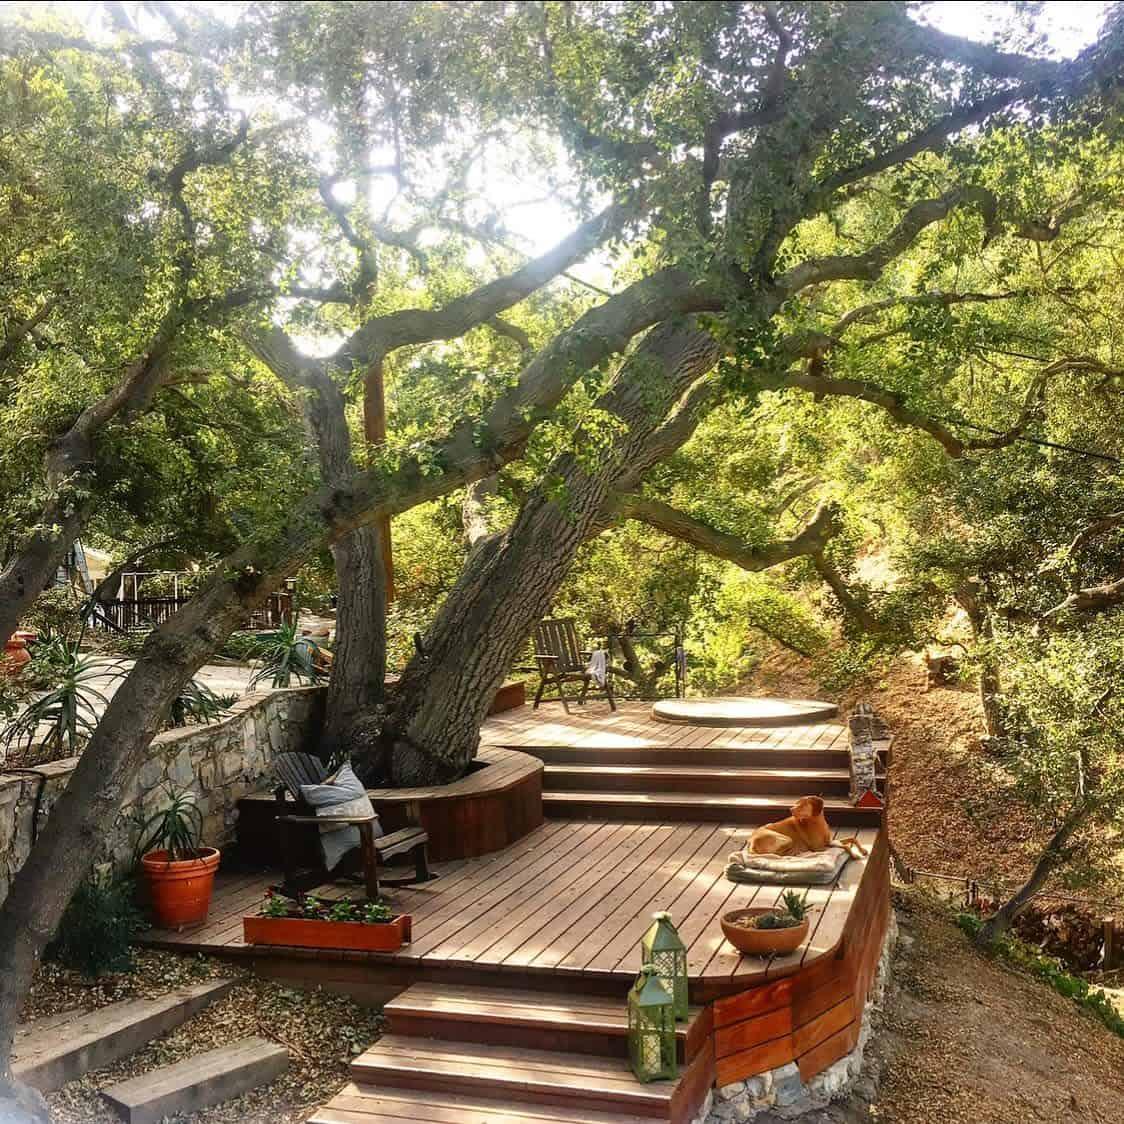 Tree Bench Garden Bench Ideas -shadygrovecottage